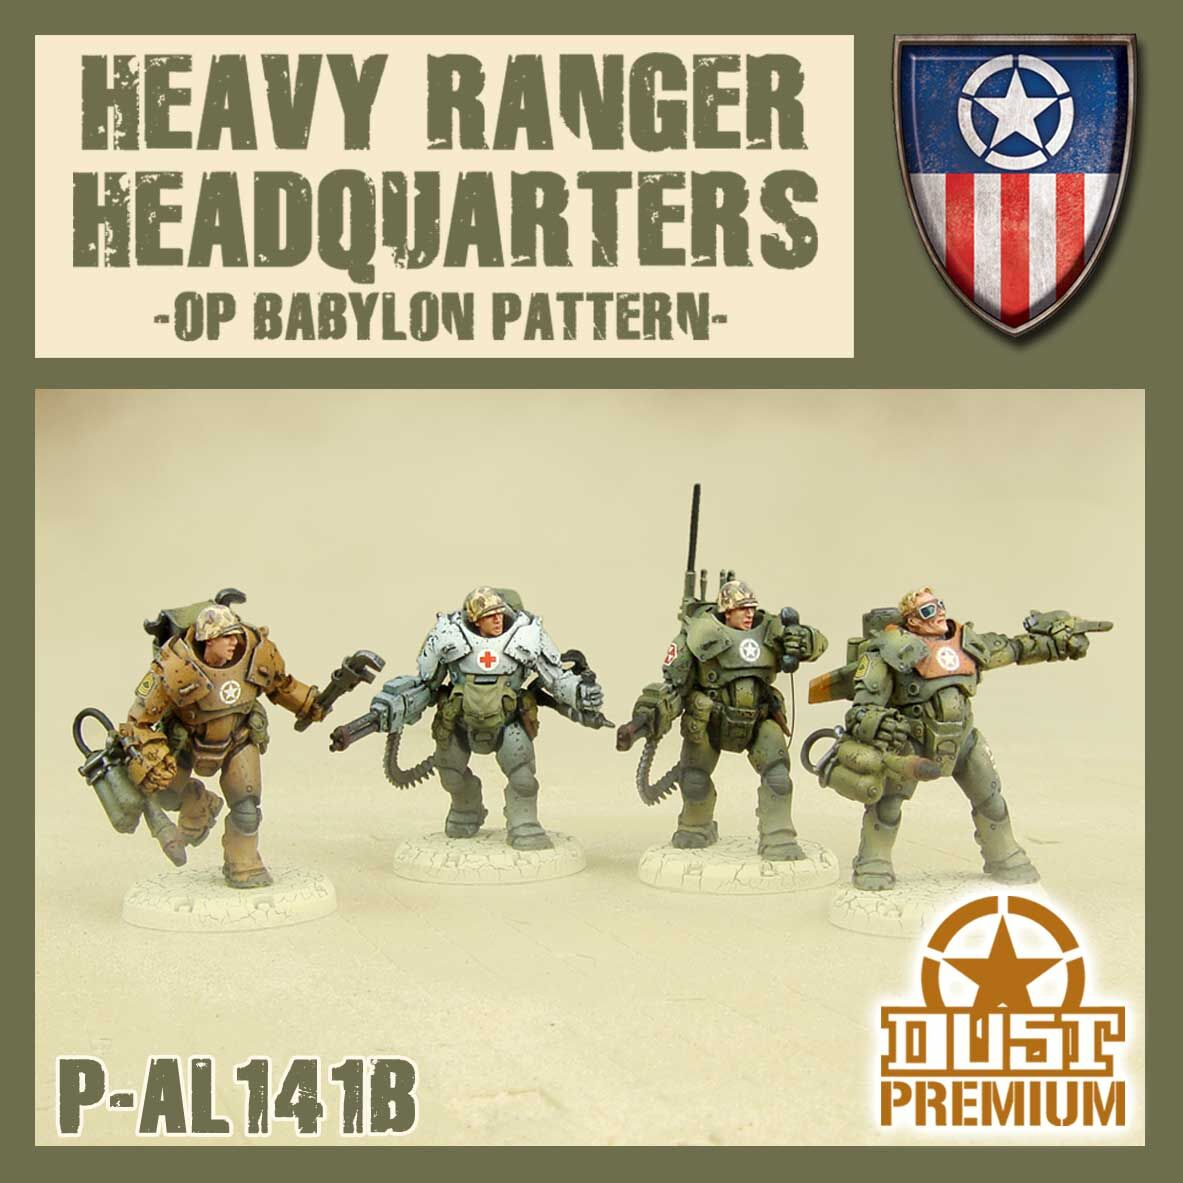 Heavy Ranger HQ Premium